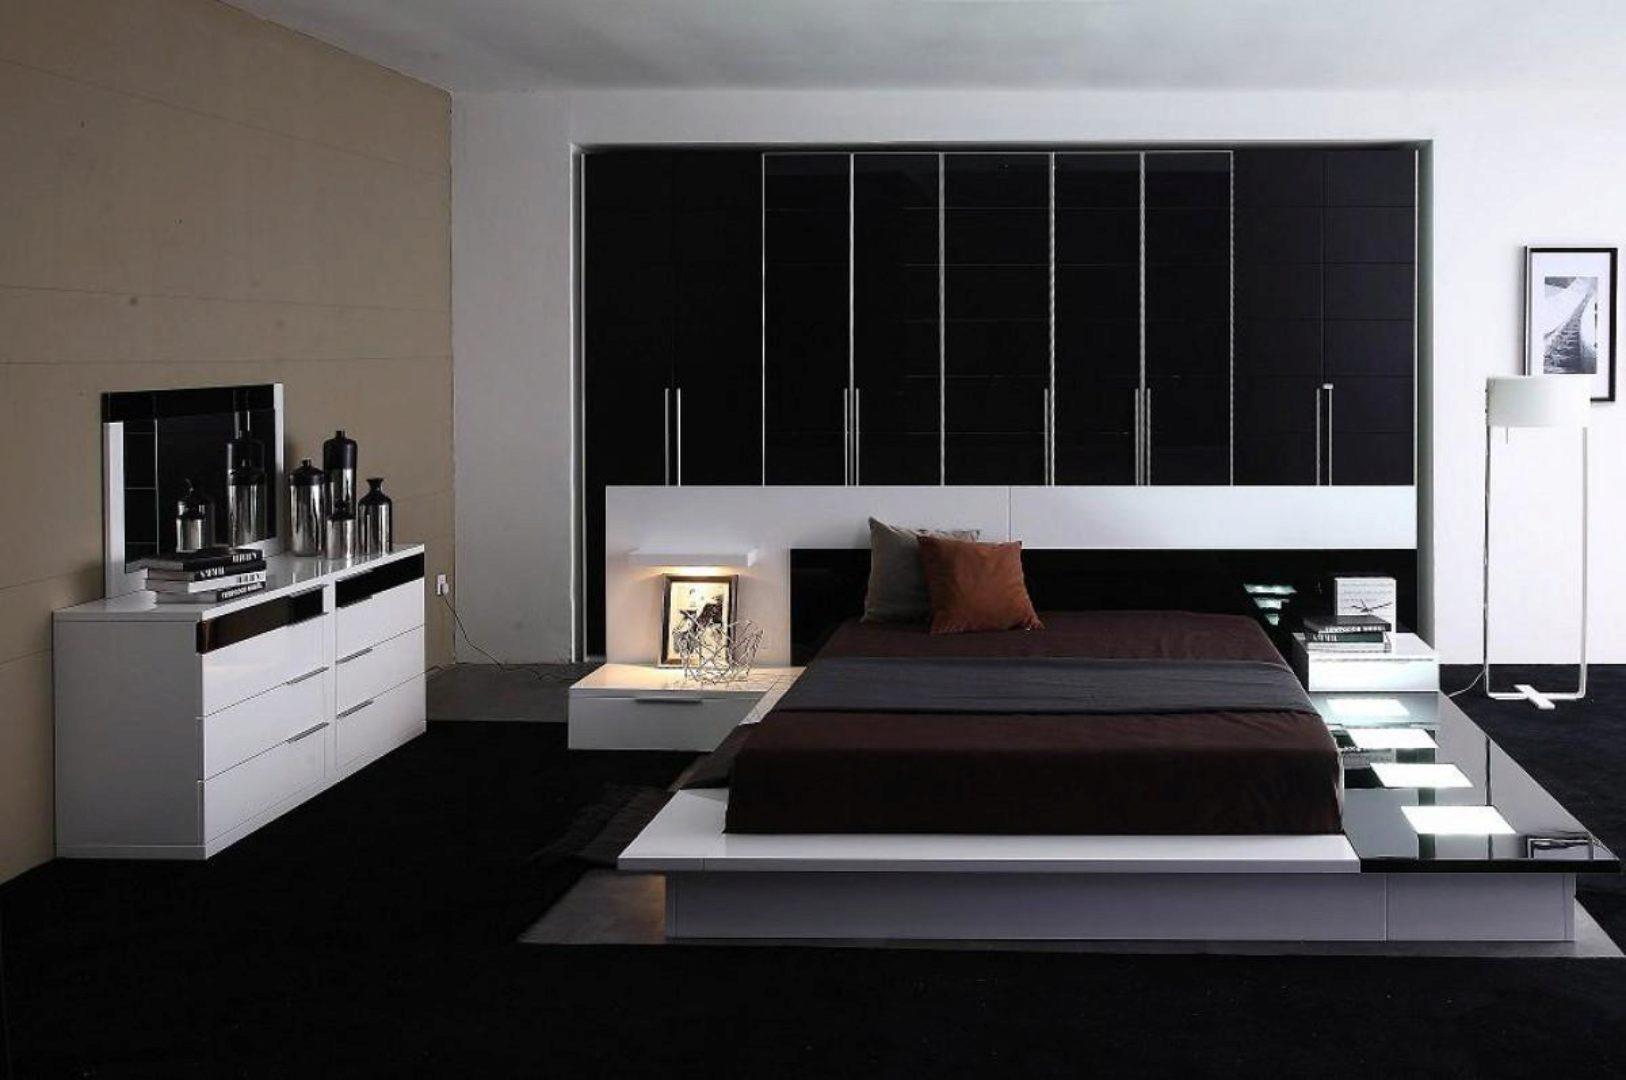 Vig Modrest Impera White Black Glossy Lacquer California King Bedroom Set 3pcs Vgwcimpera Ck Set 3